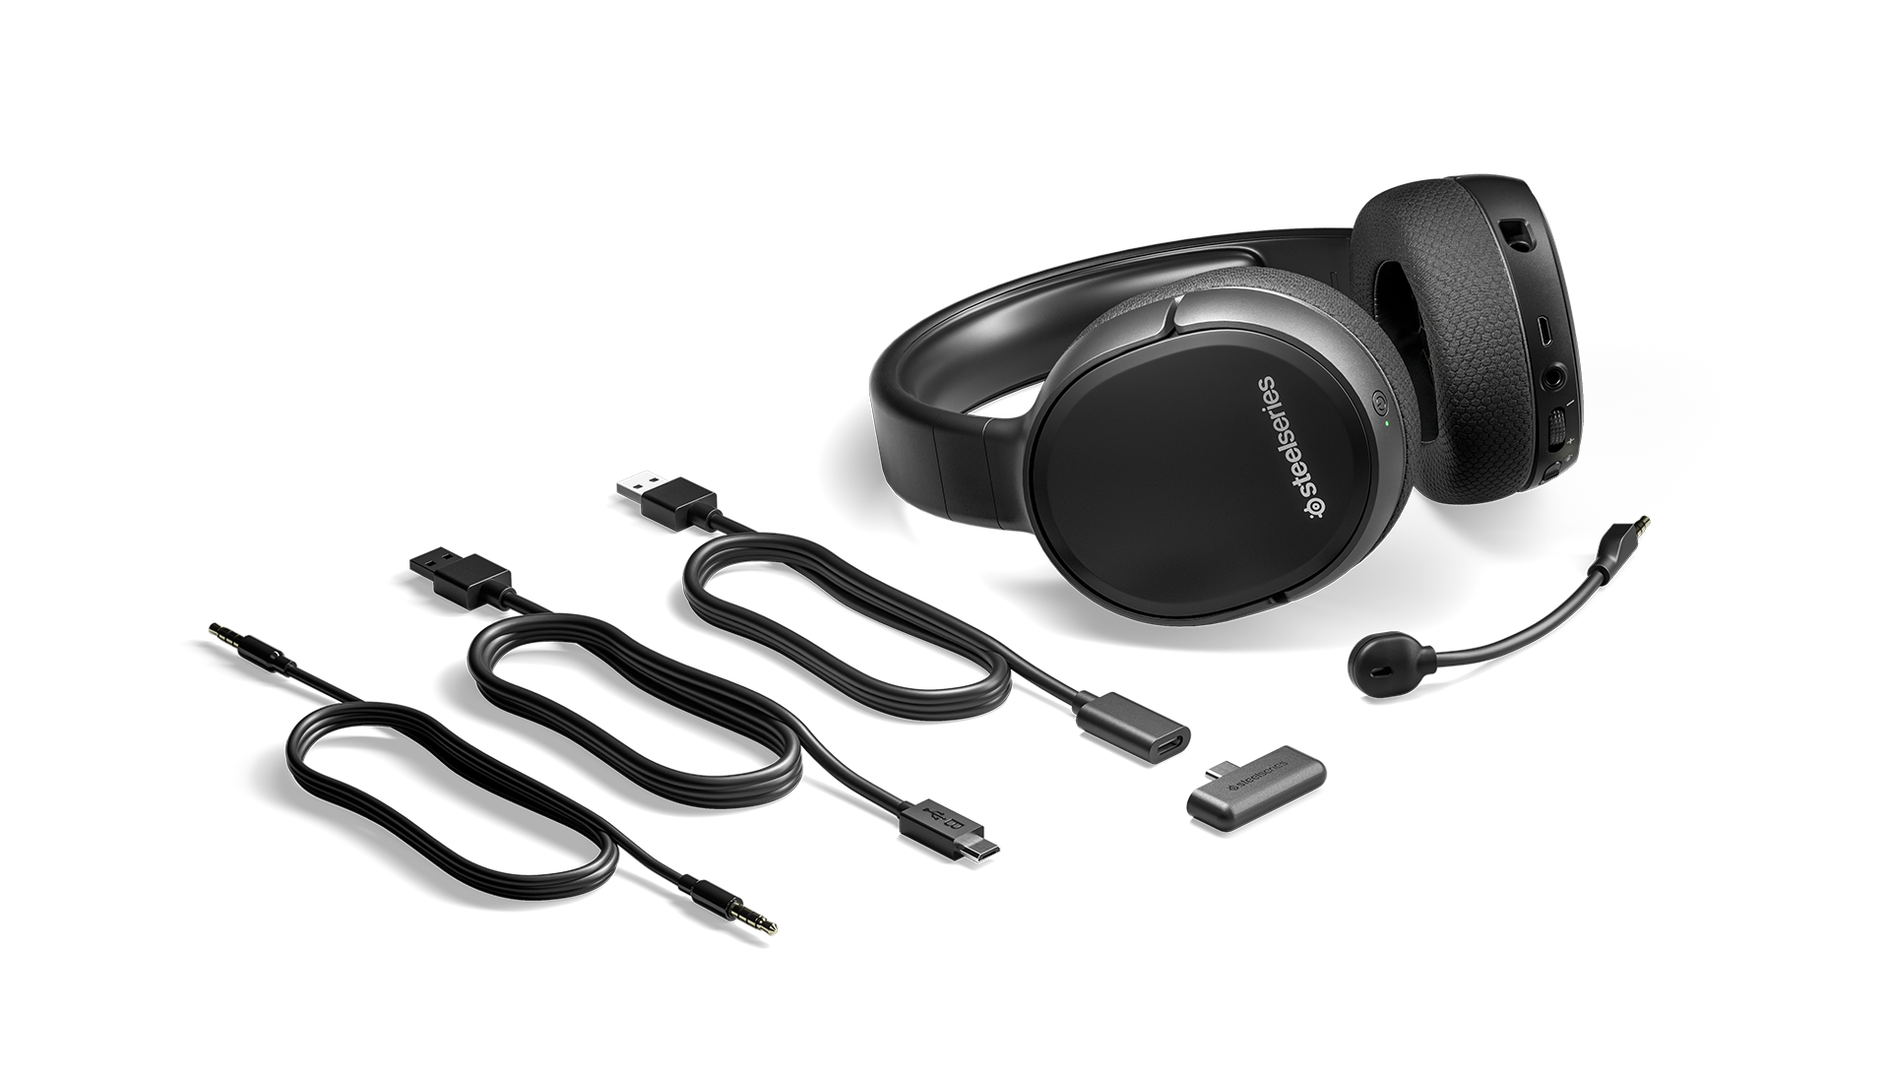 Arctis 1 Wireless Gaming Headset Steelseries